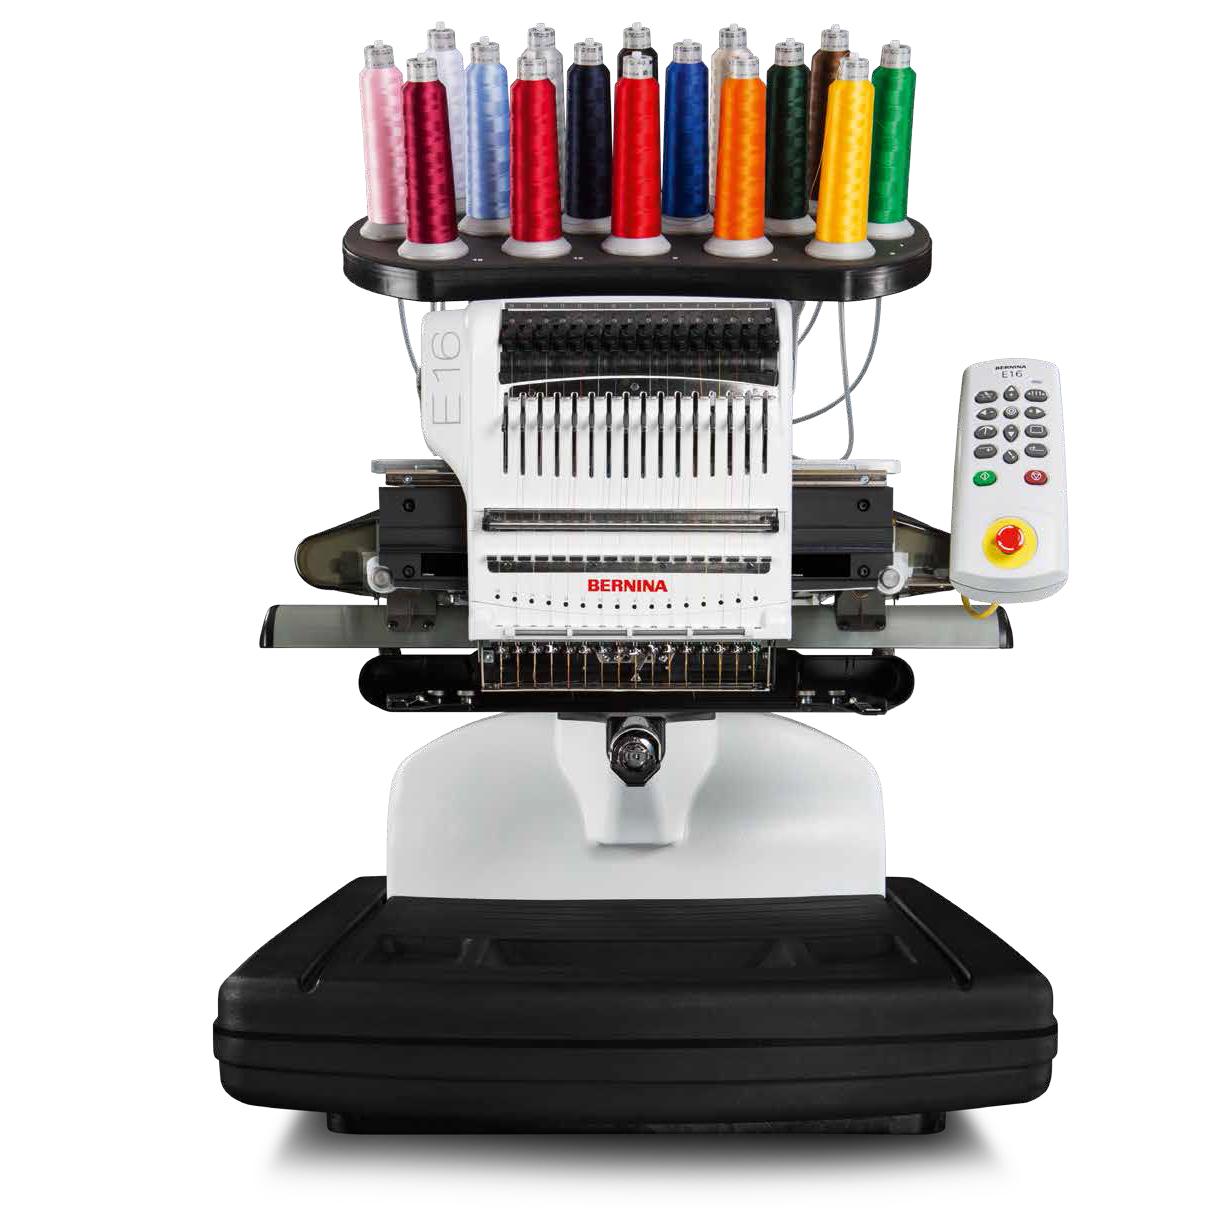 bernina embroidery machine reviews